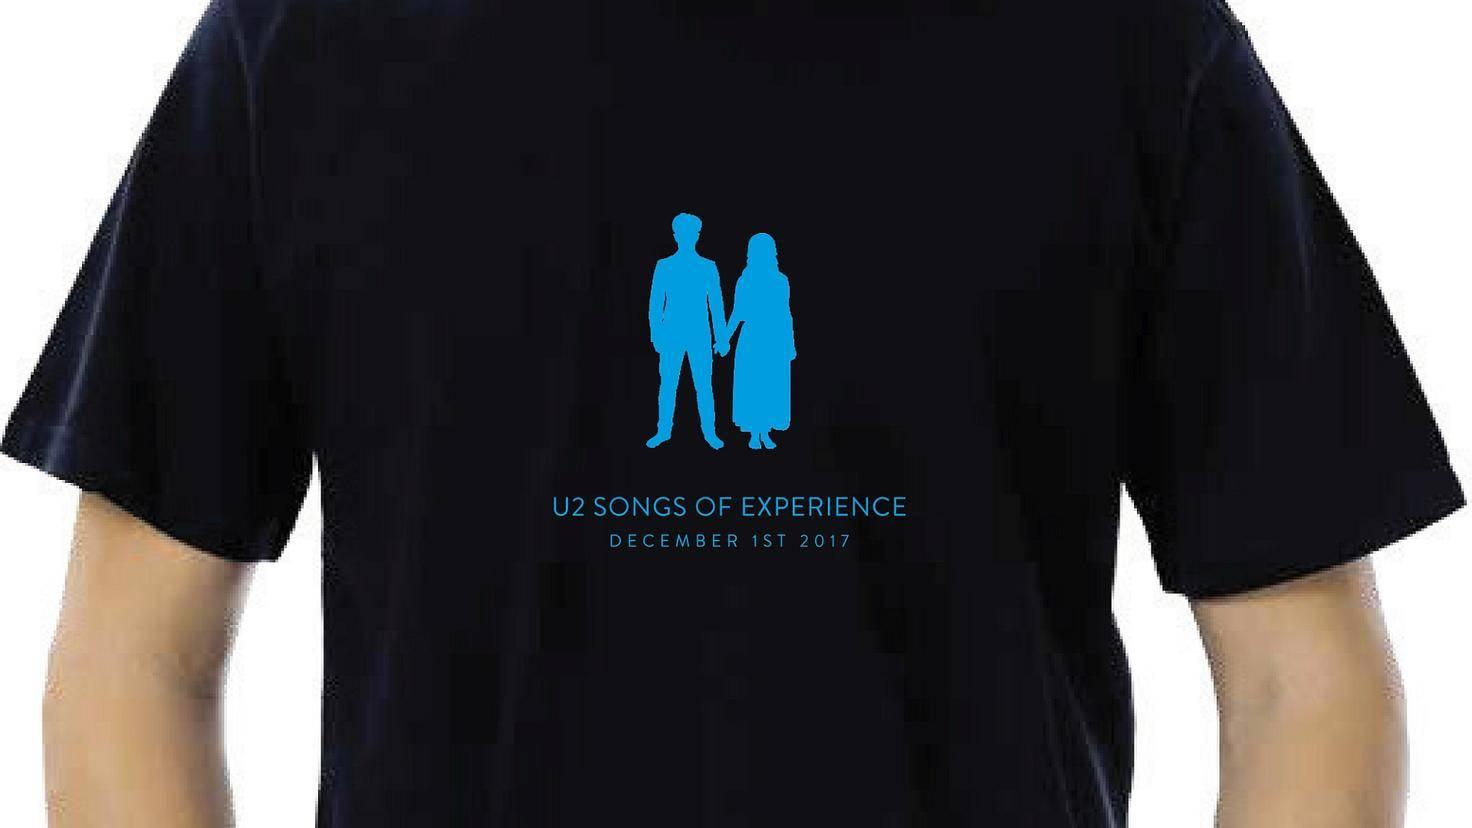 u2-songs-of-experience-gewinnspiel-t-shirt